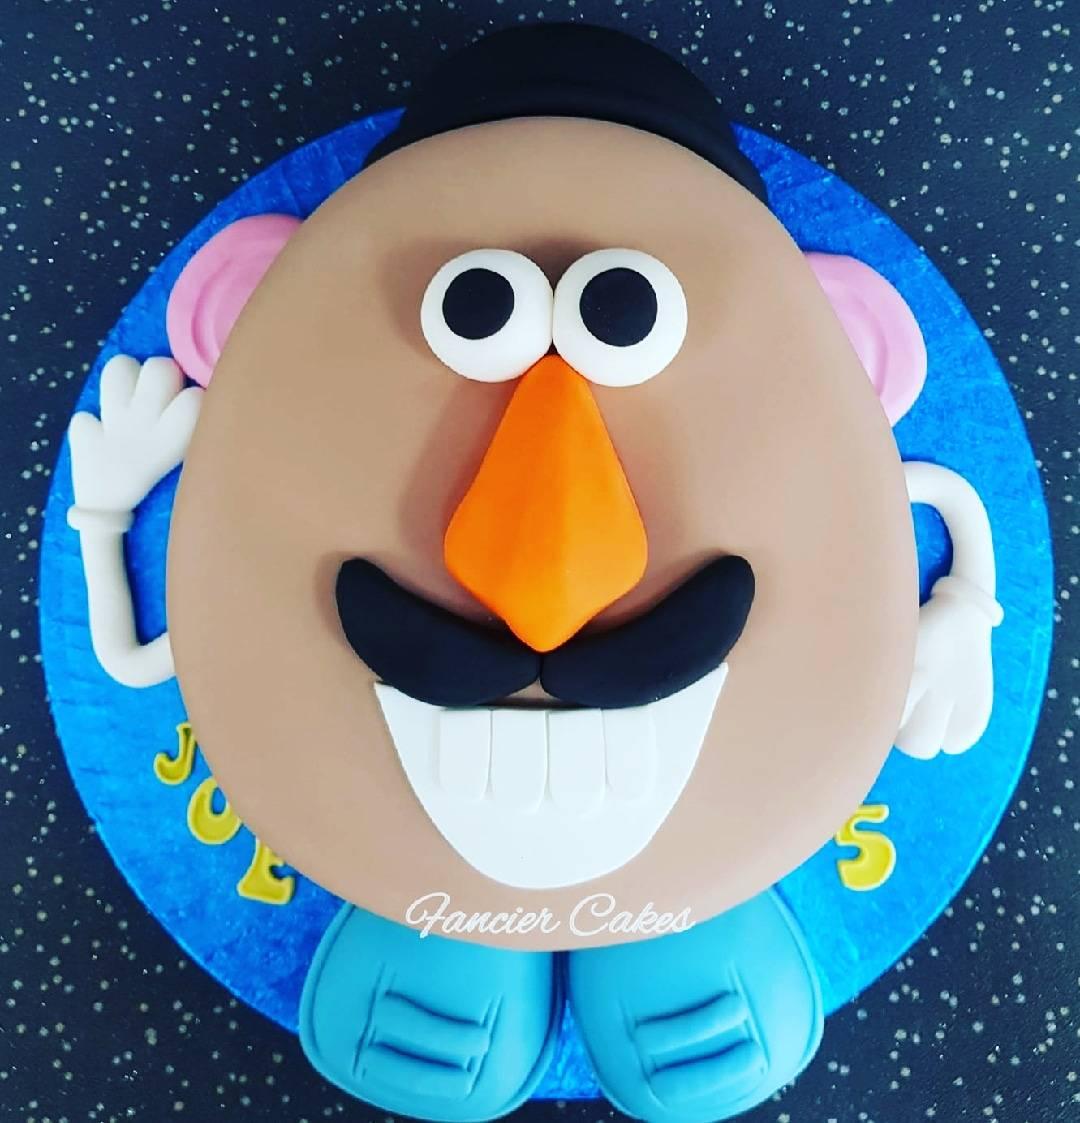 Phenomenal Fancier Cakes Auf Twitter A Very Cool 2D Mr Potato Head Birthday Personalised Birthday Cards Veneteletsinfo